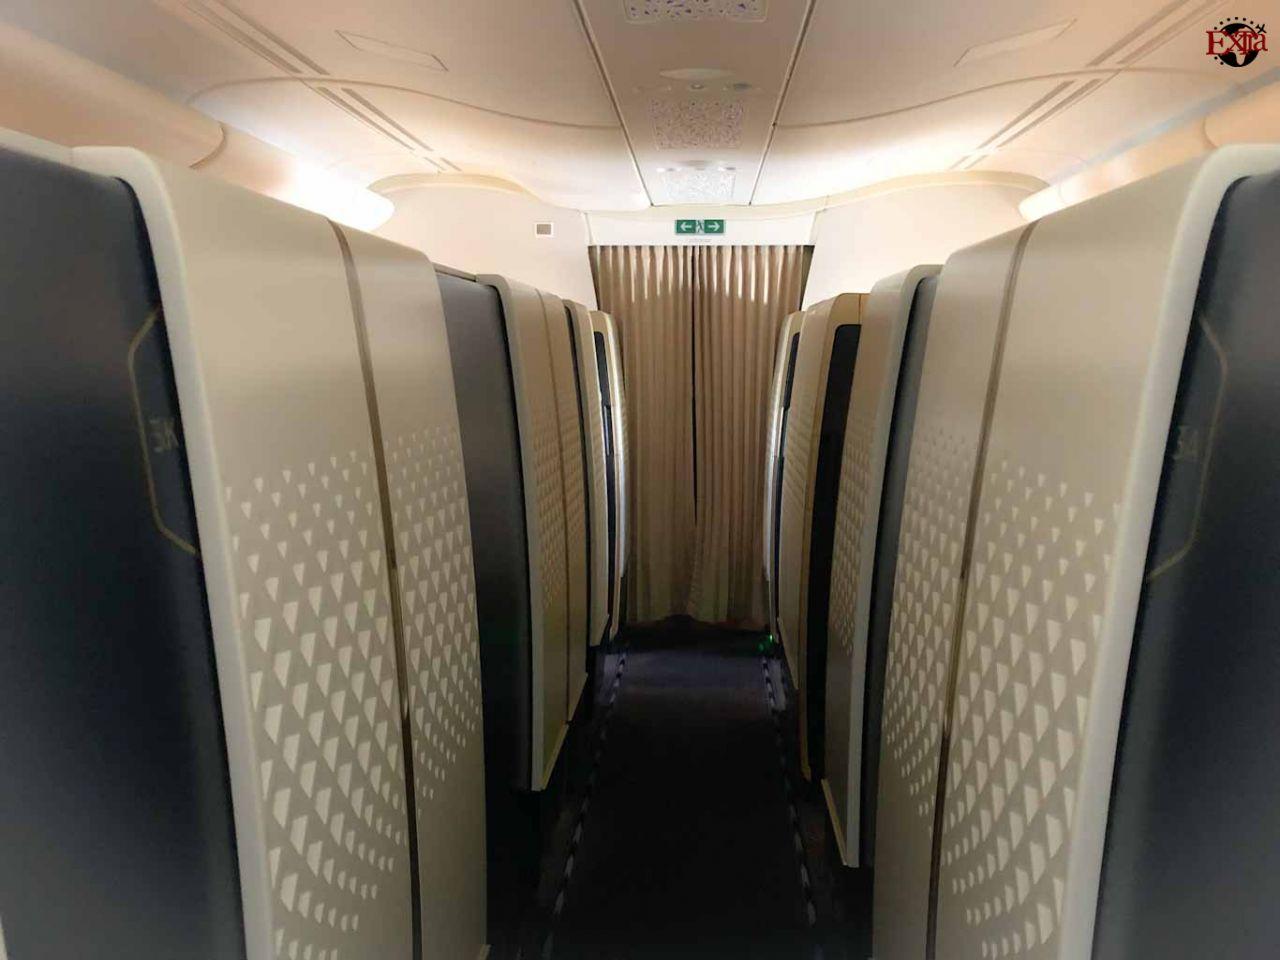 Etihad Airways First Class Cabins